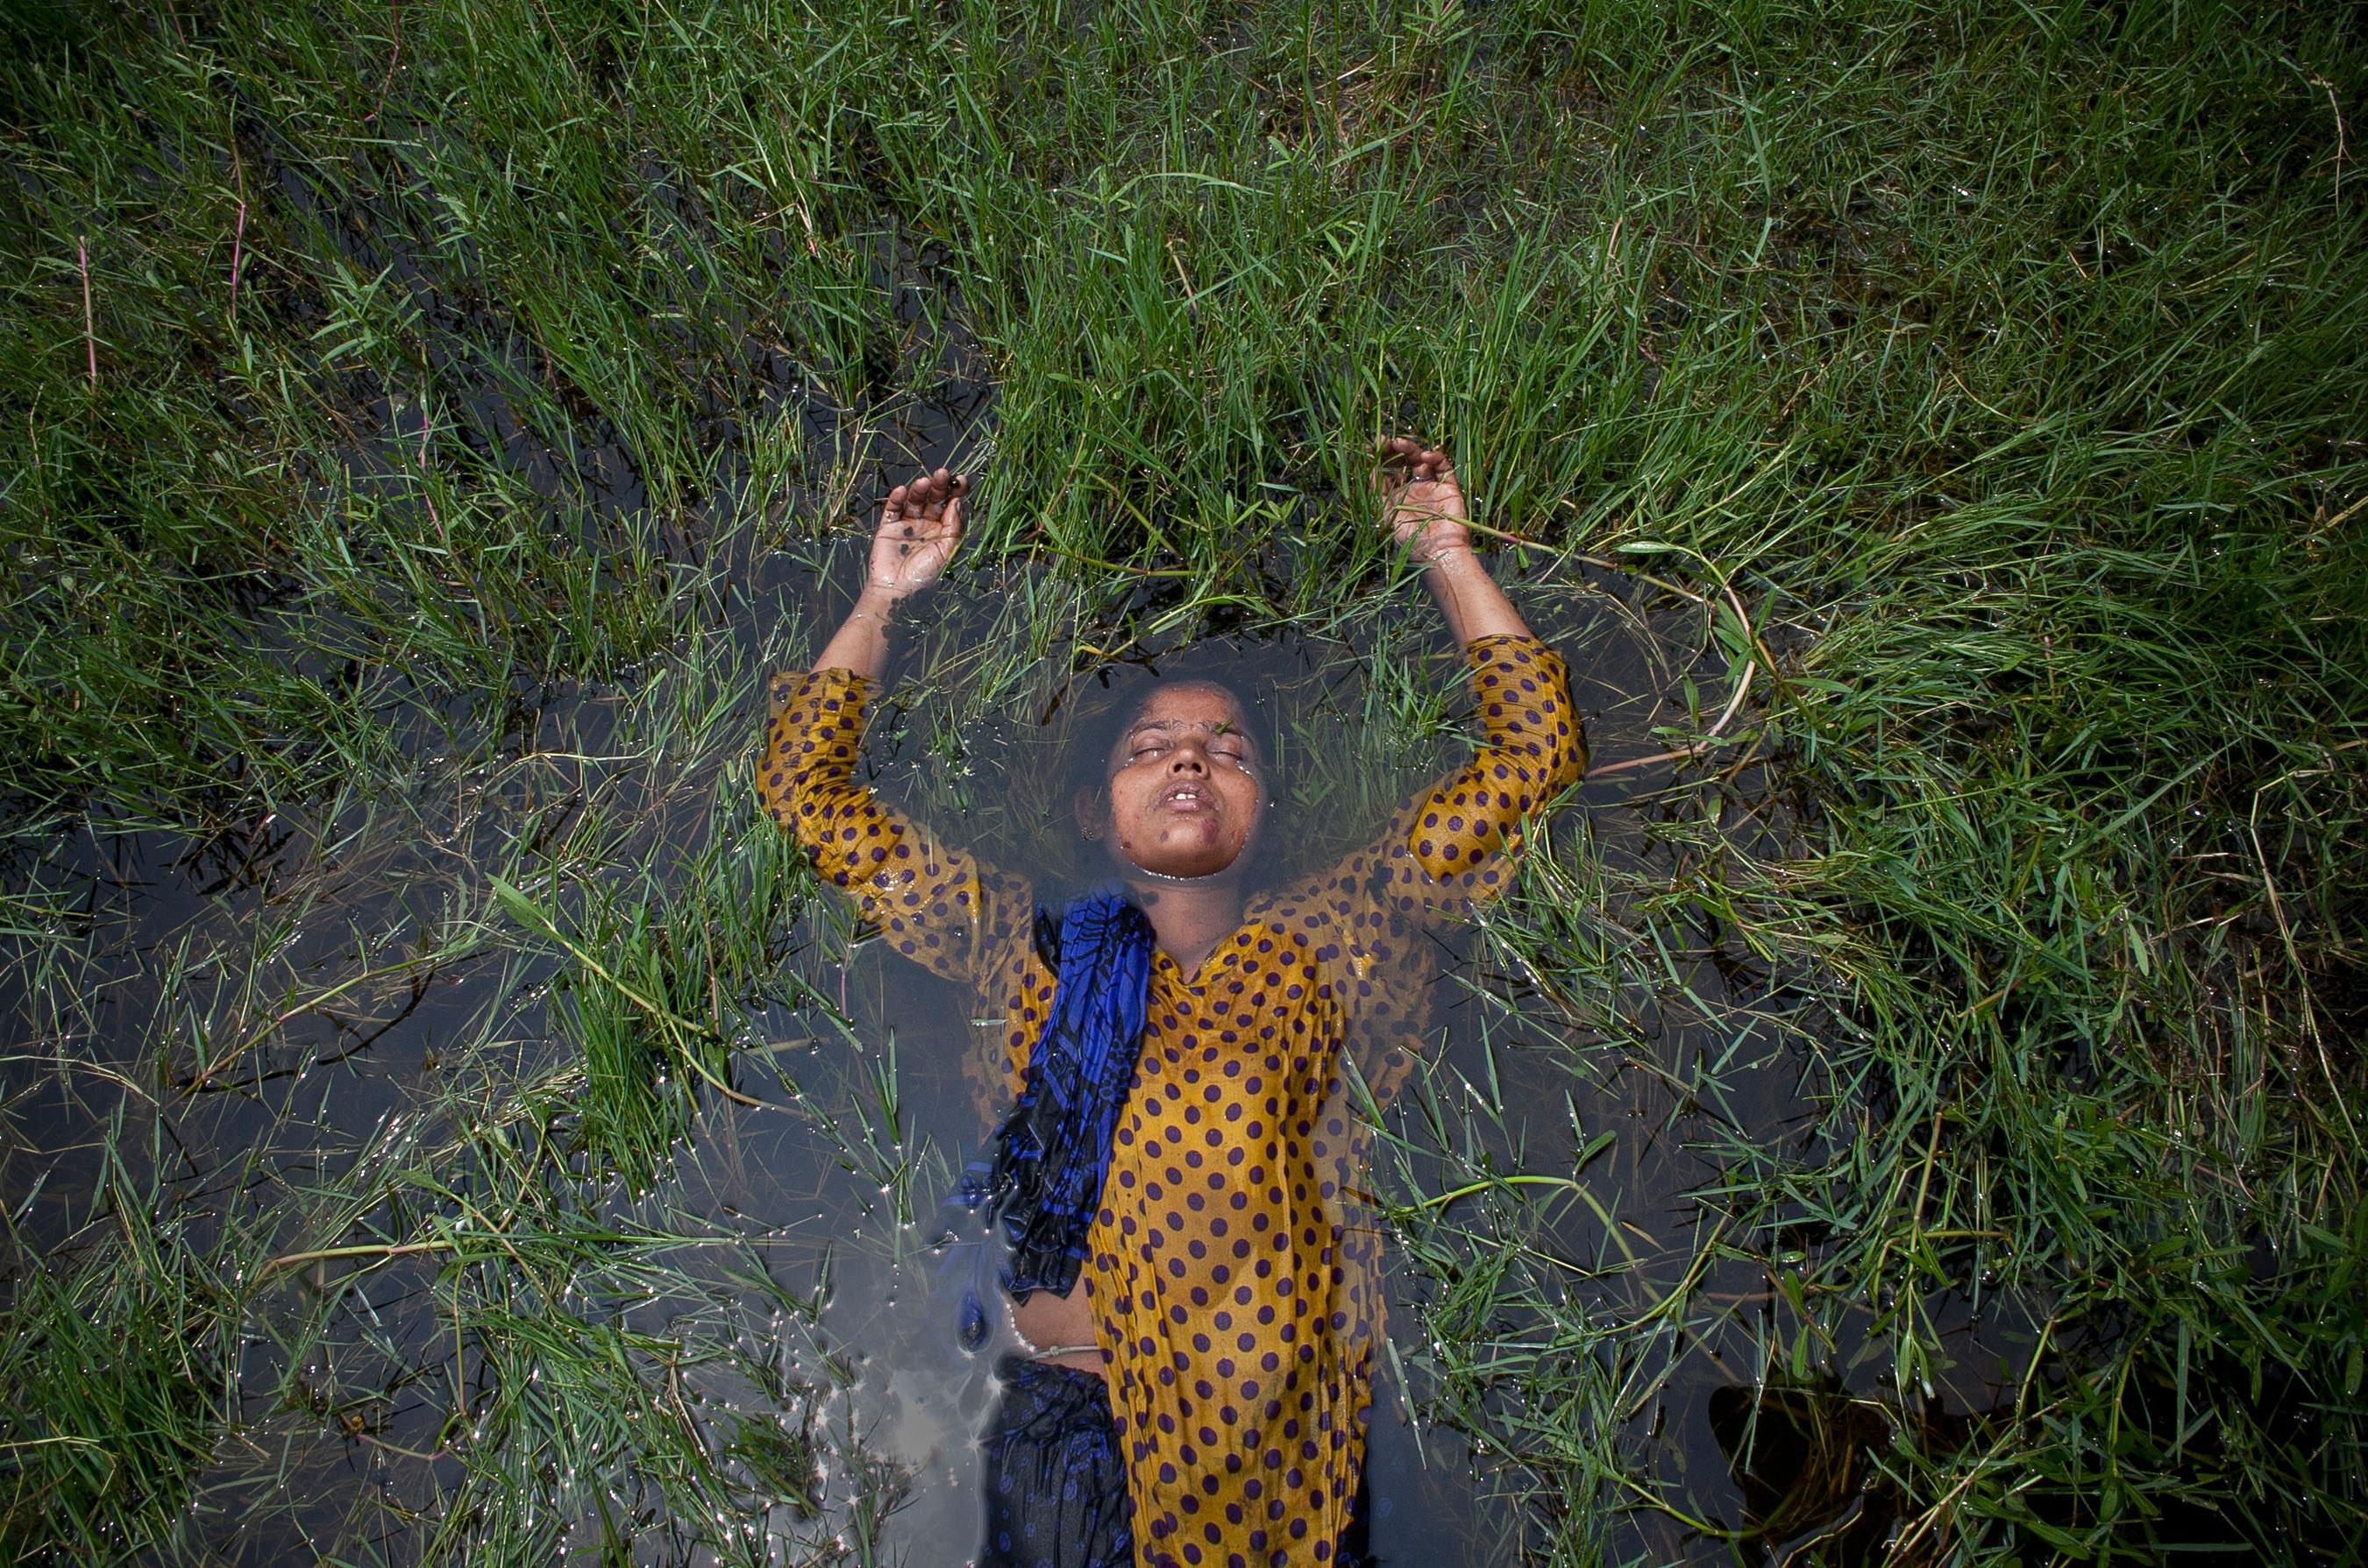 Mental Health in Bangladesh by Allison Joyce.